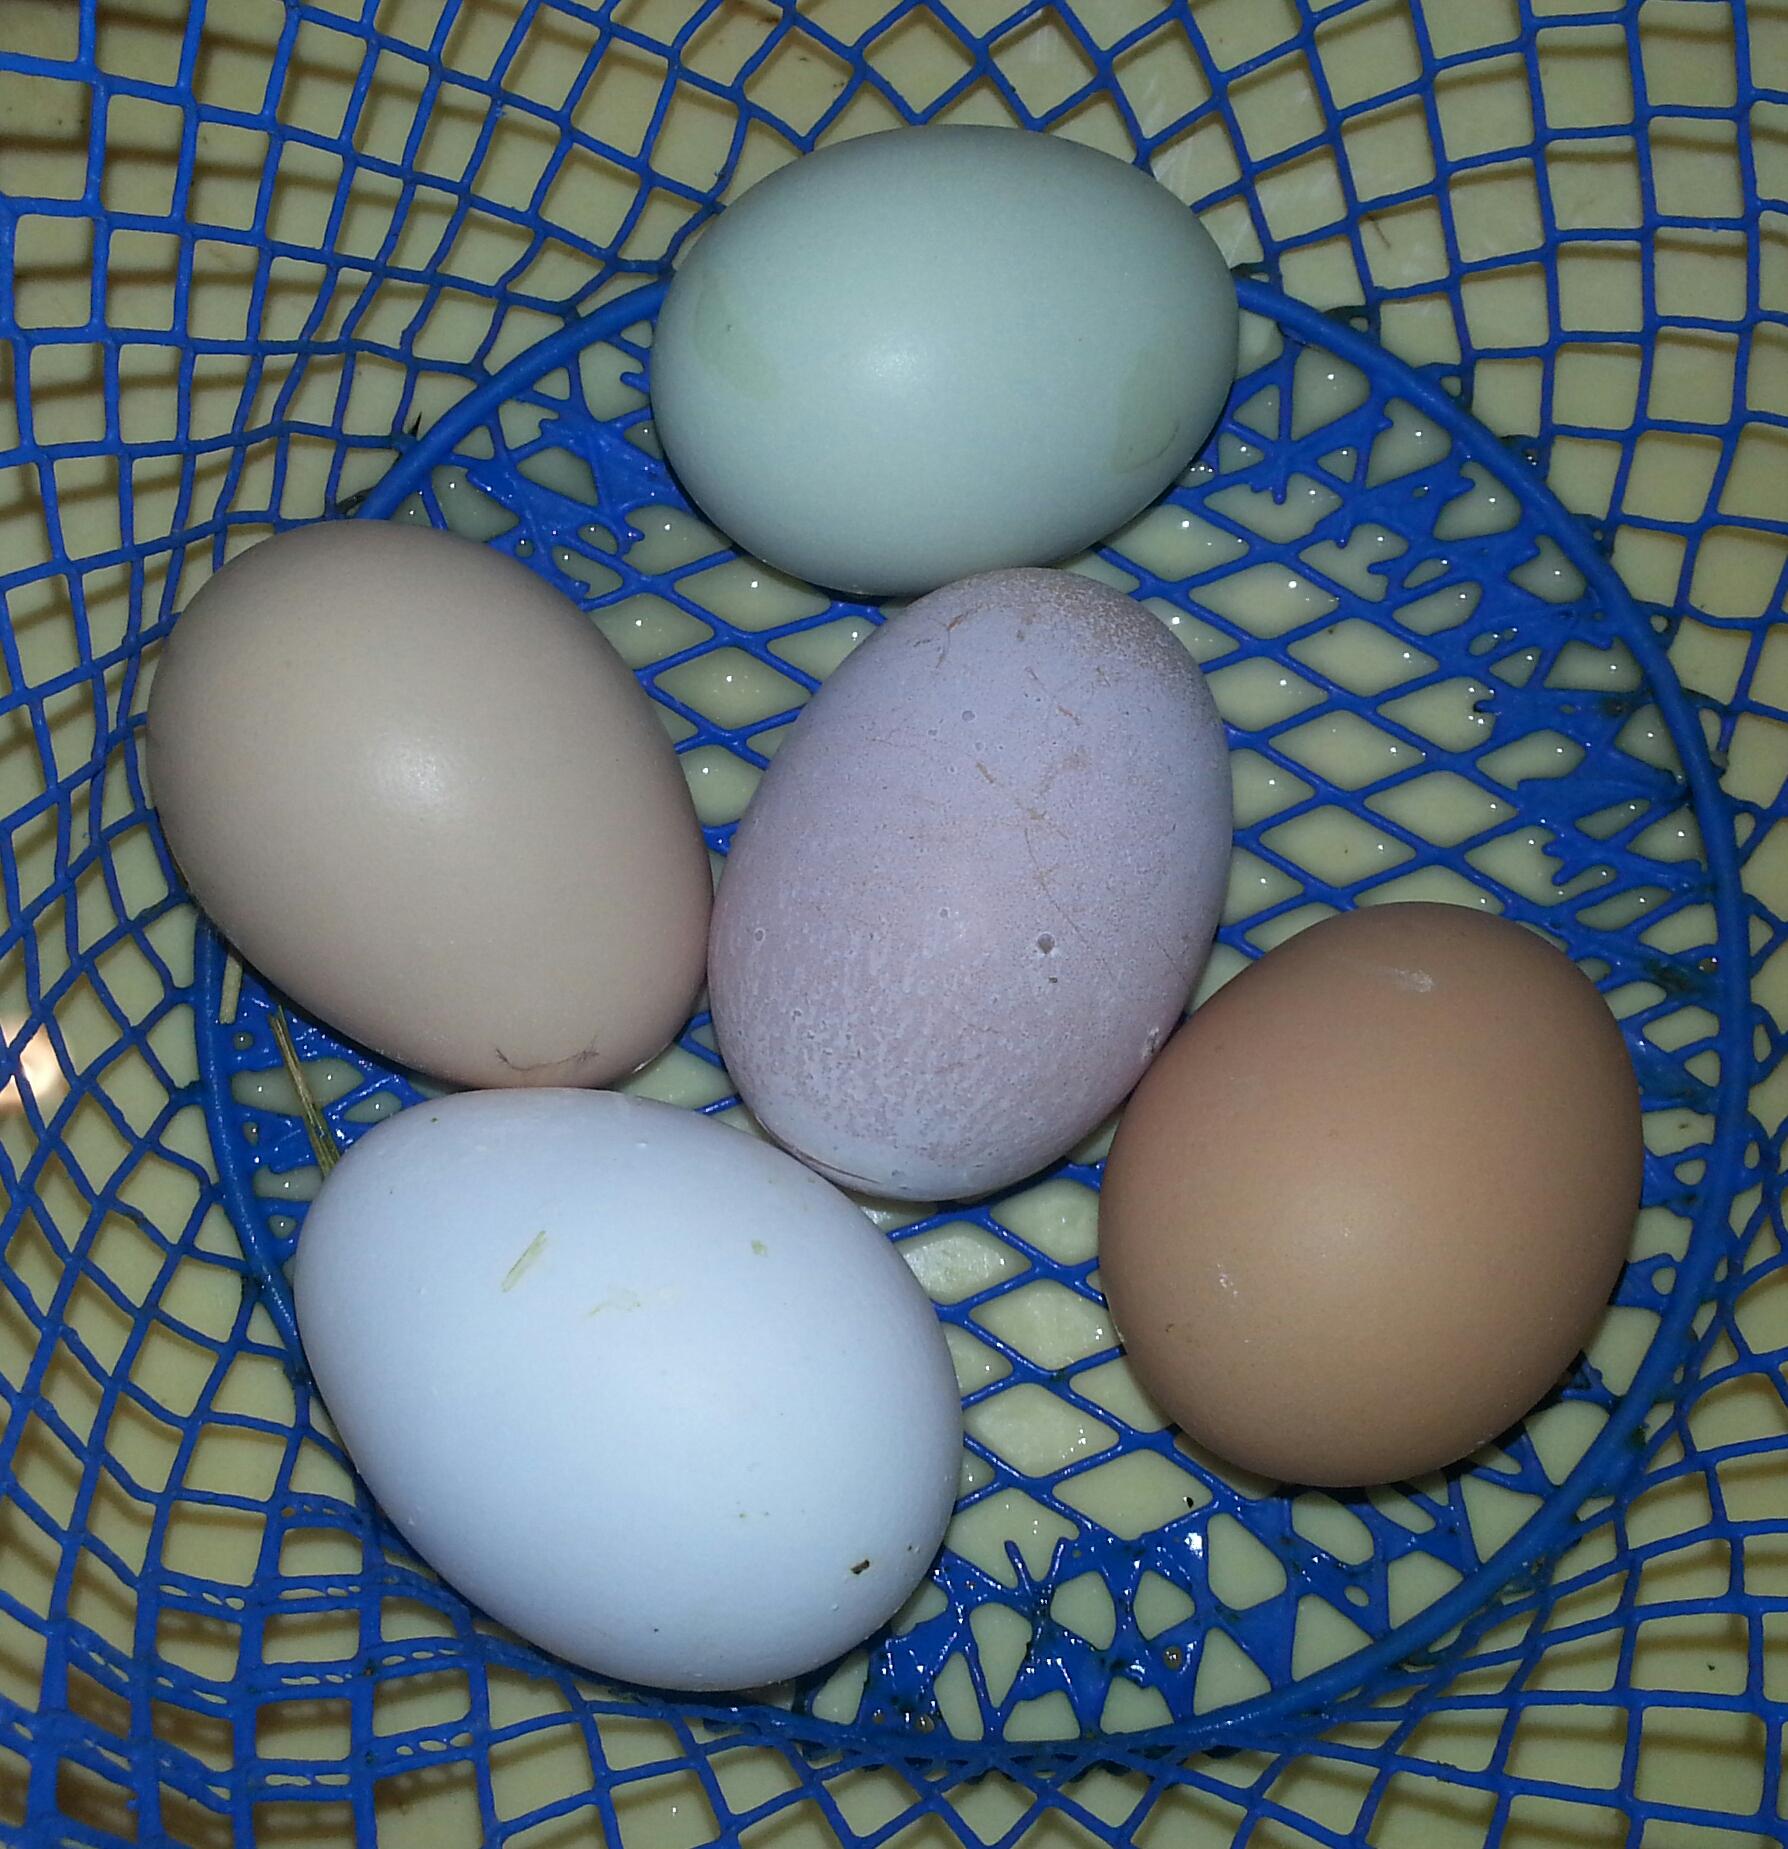 sell eggs